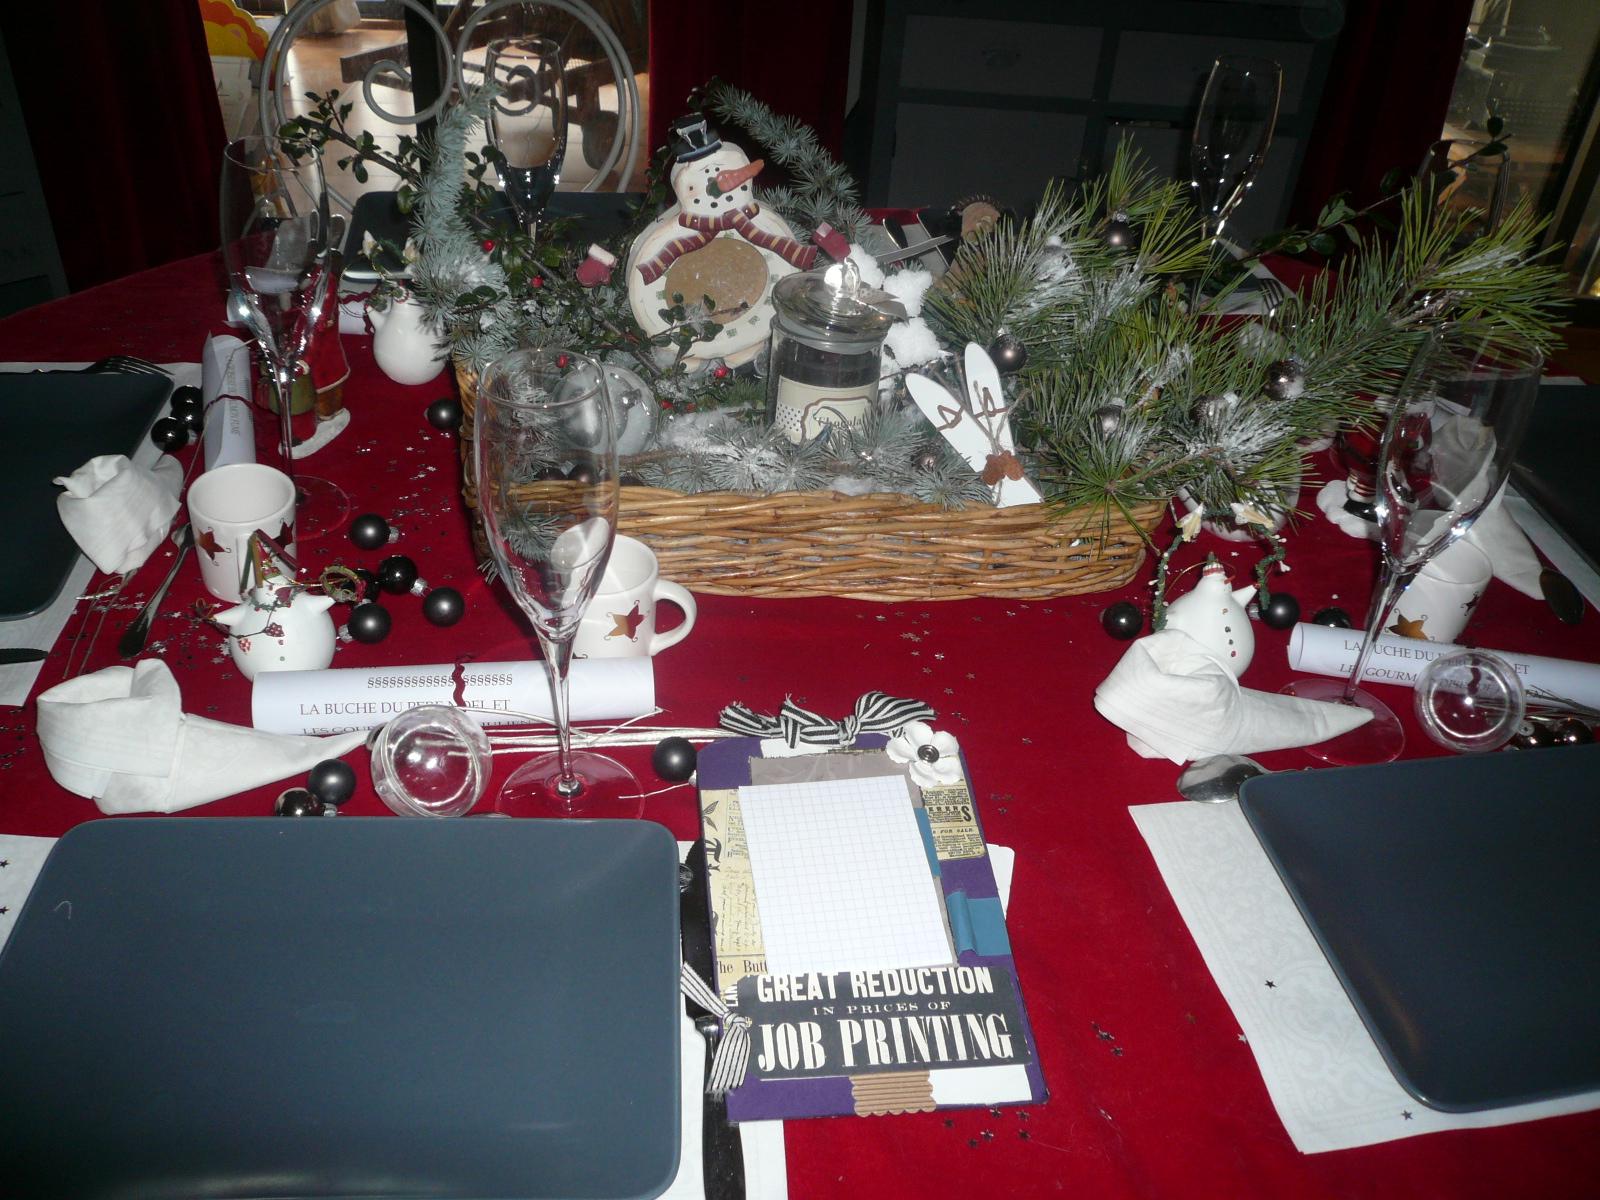 #771021 SCRAPRETTY: Décembre 2011 5851 tutoriel decoration de table de noel 1600x1200 px @ aertt.com